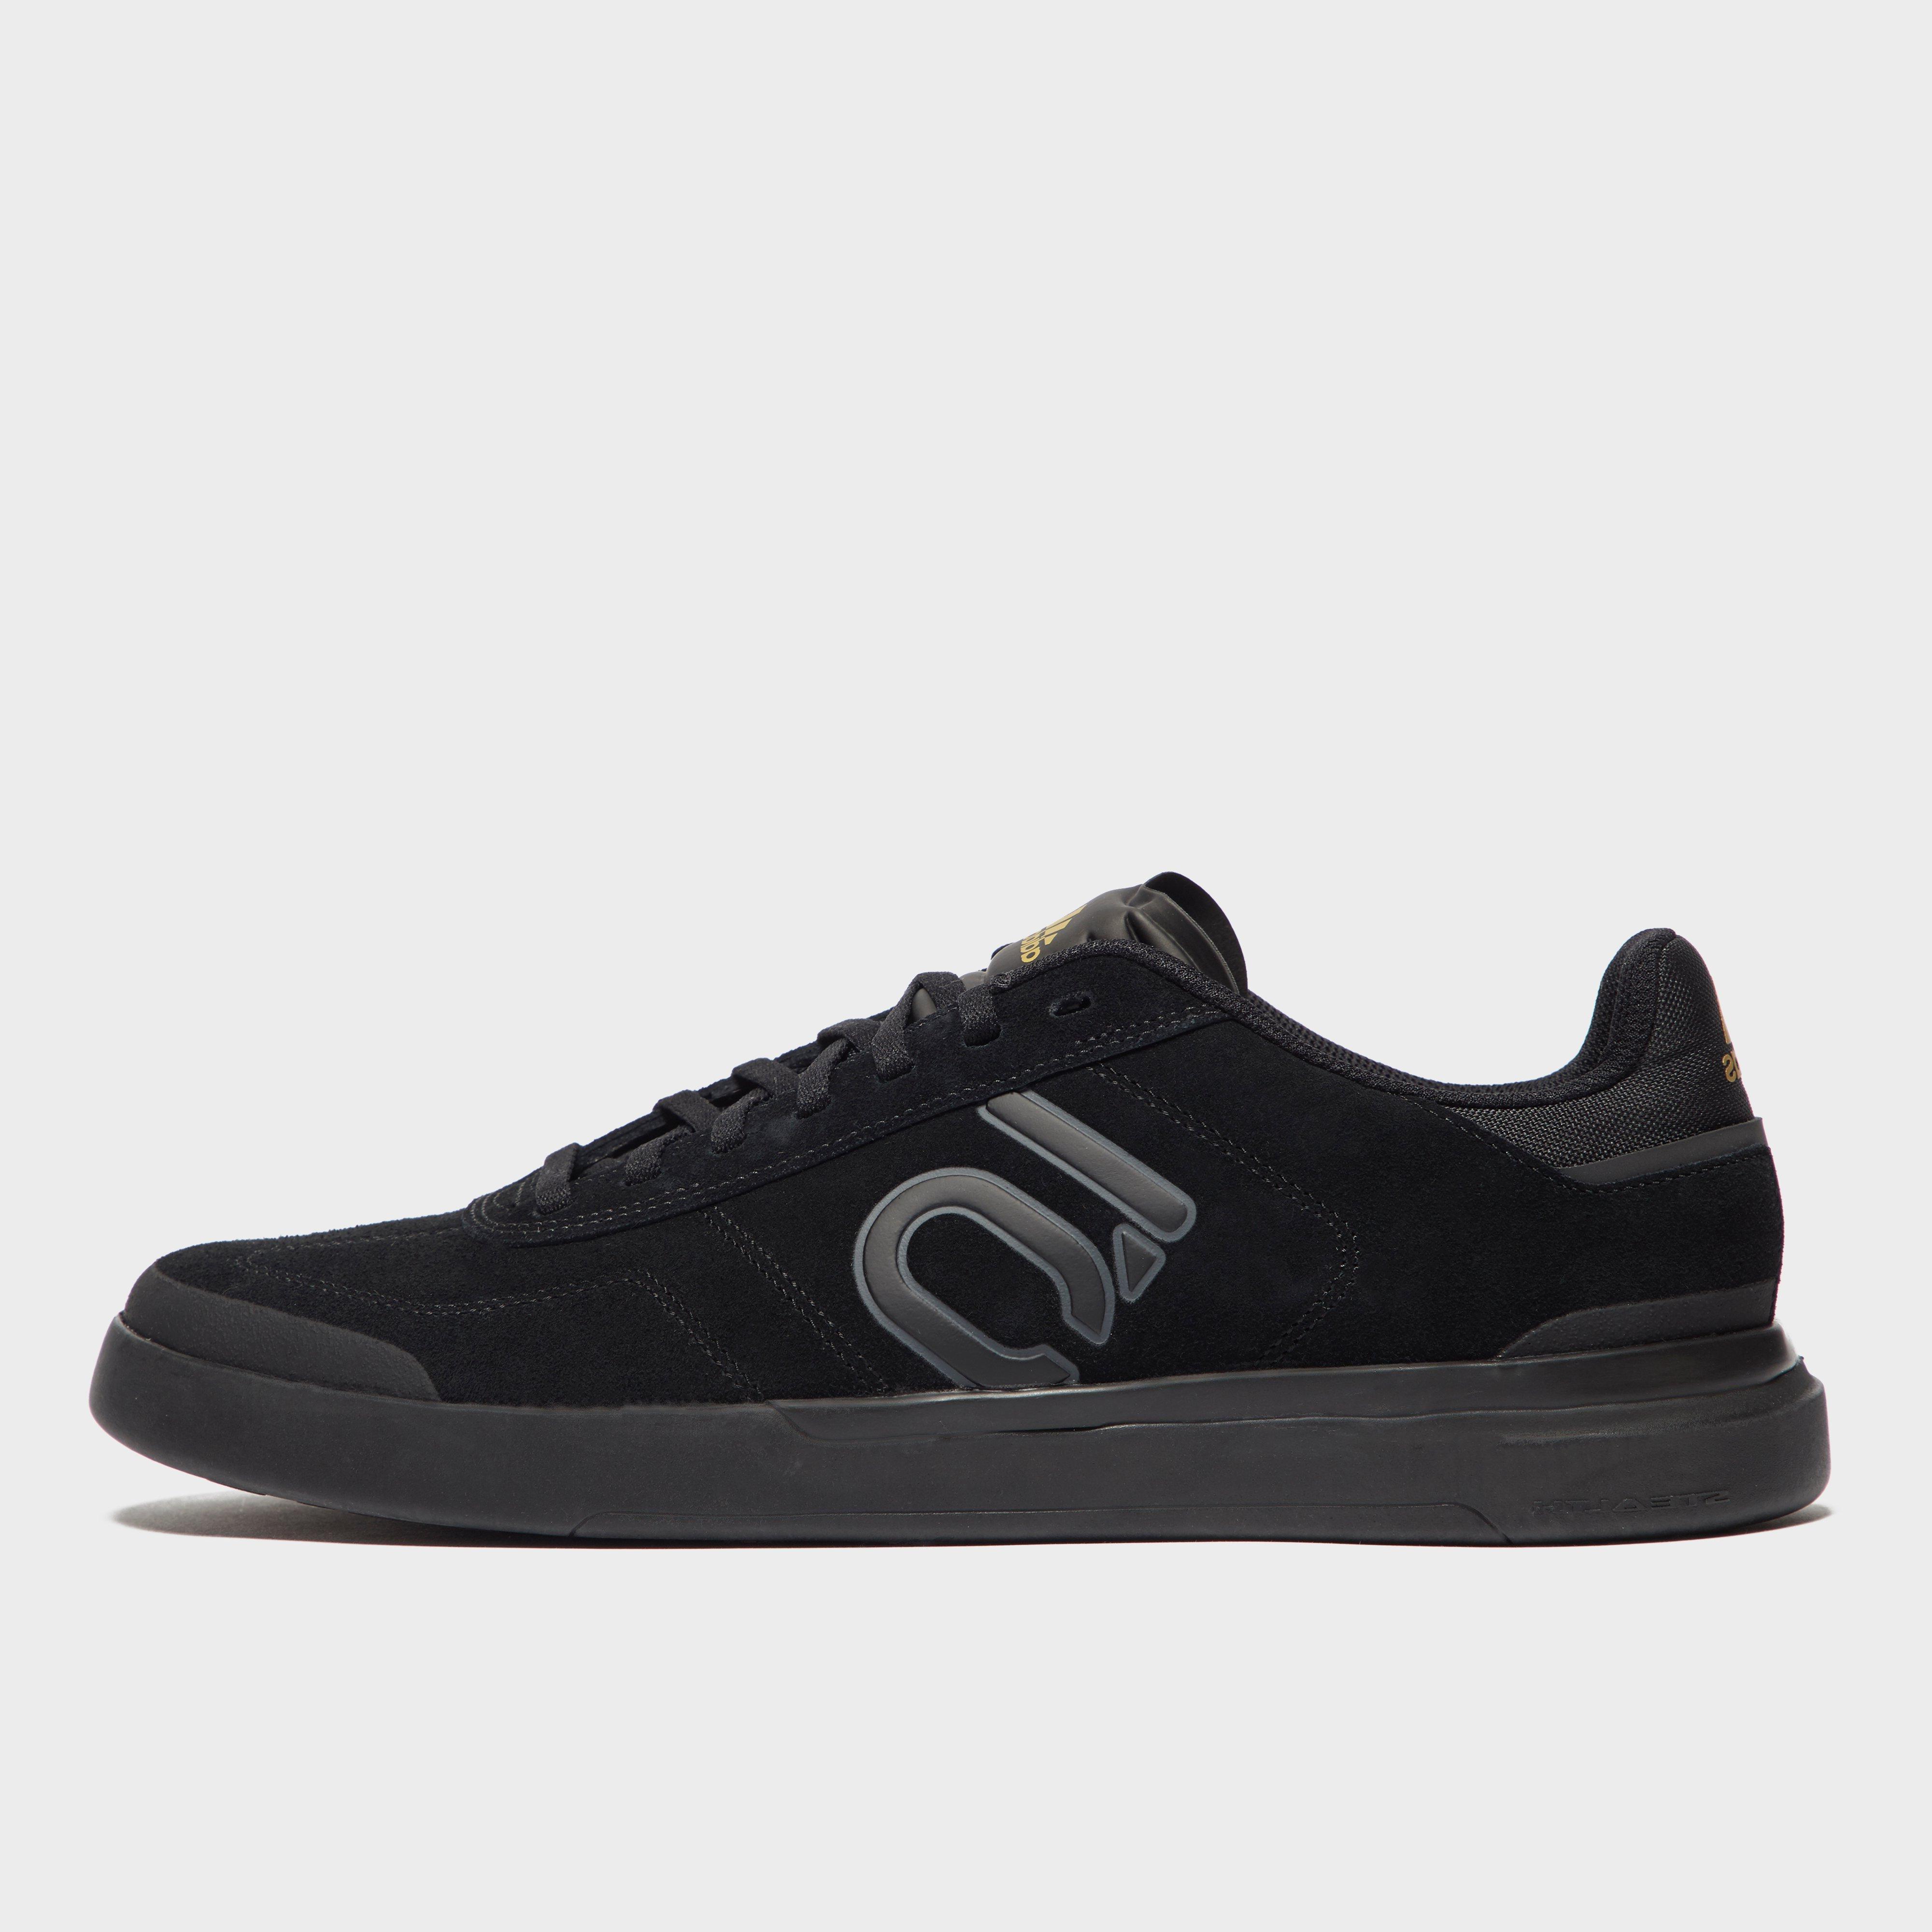 Adidas Five Ten Adidas Five Ten Unisex Sleuth Deluxe Shoes - Black, Black